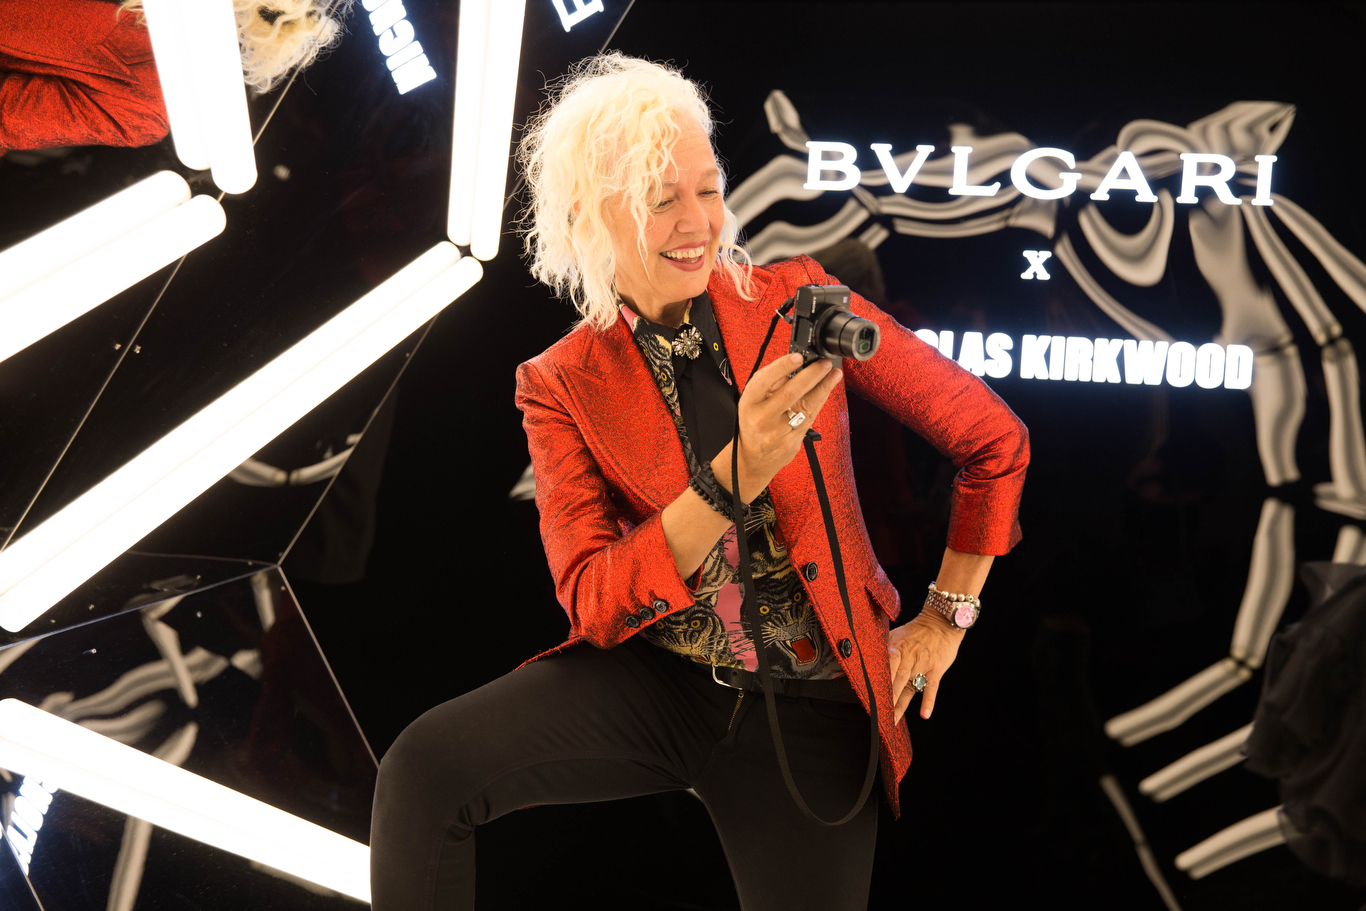 Ellen von UNWERTH.. Bulgari X Nicholas Kirkwood. MFW. Milan. Italy. 092017 © david atlan